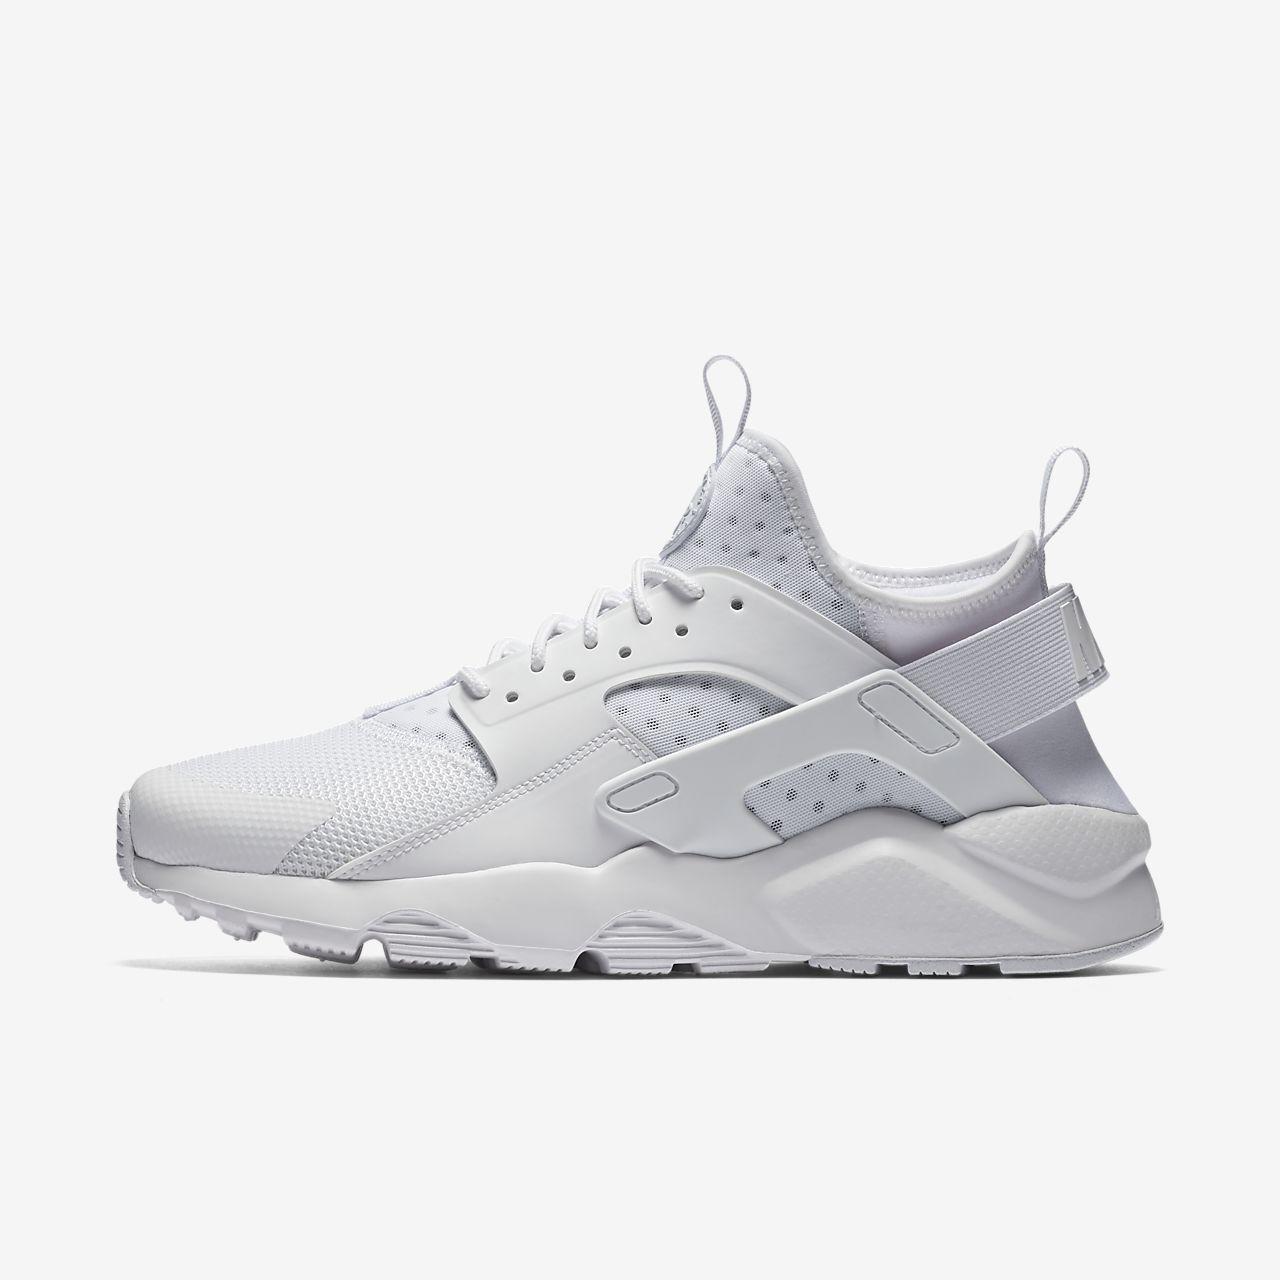 separation shoes 15822 06b56 ... Pánská bota Nike Air Huarache Ultra